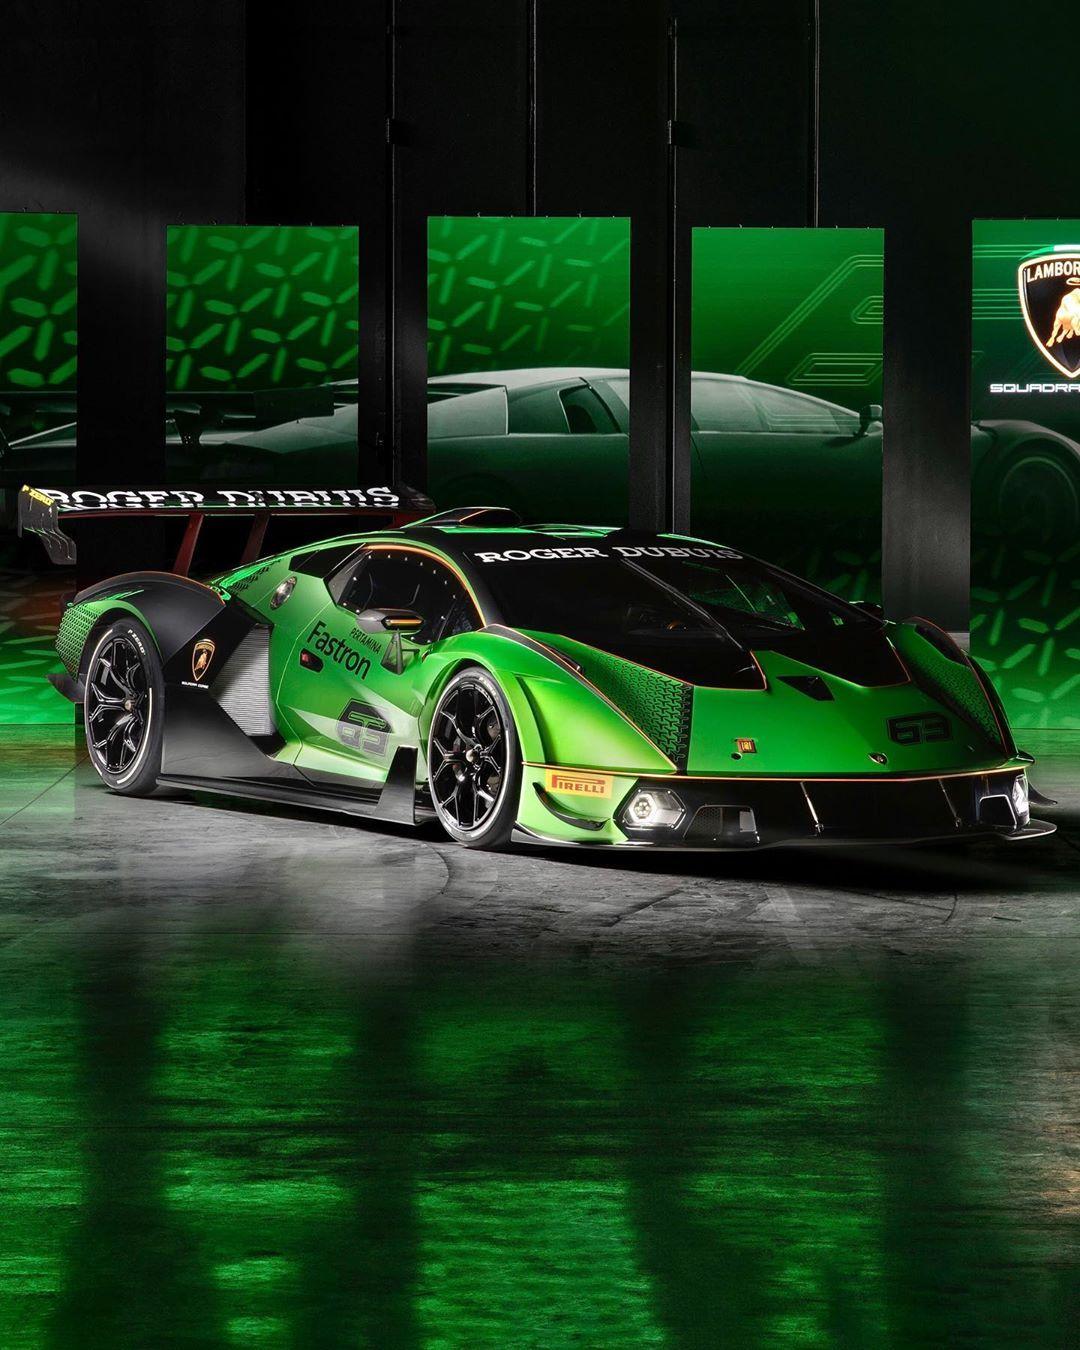 2021 Lamborghini Essenza Scv12 In 2020 Super Luxury Cars Futuristic Cars Lamborghini